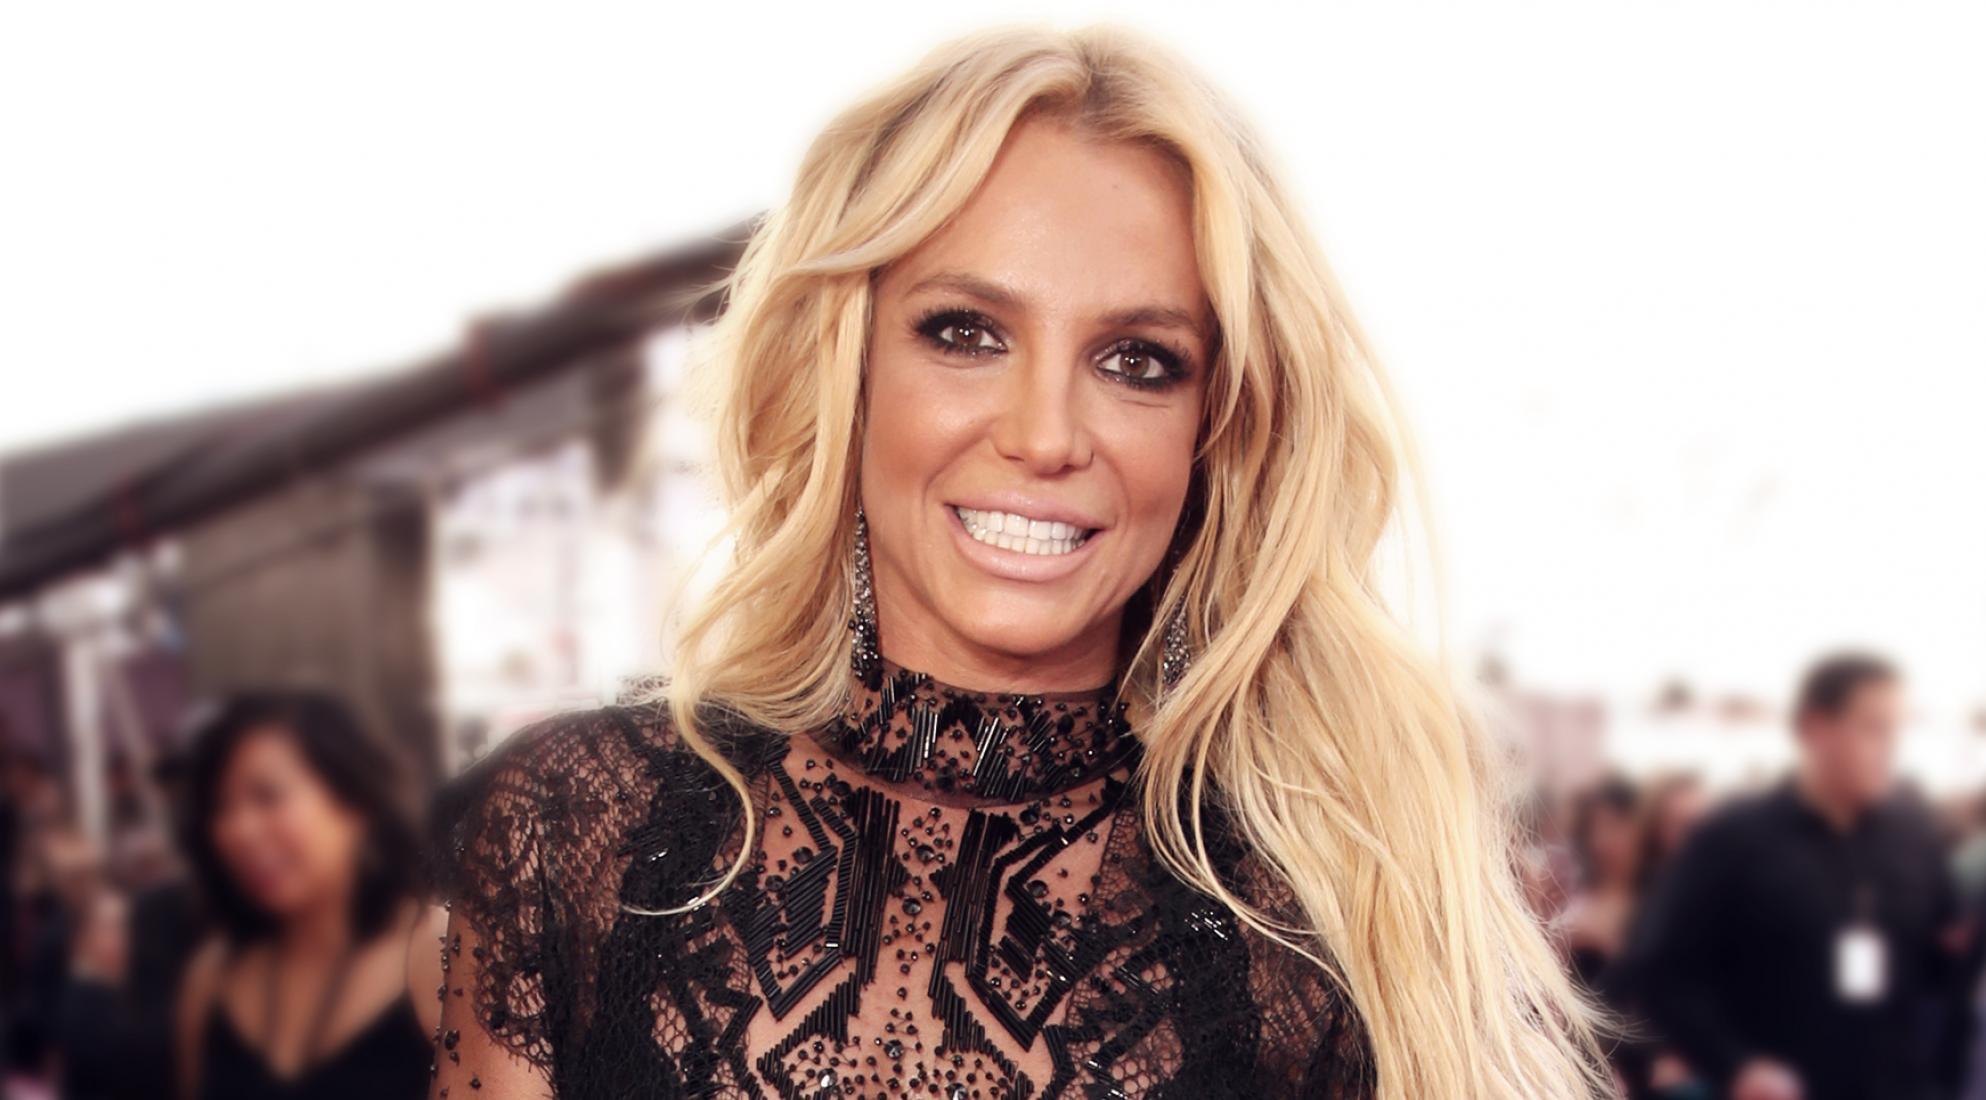 Britney Spears promijenila tekst svoje pjesme kako bi poslala poruku o koronavirusu